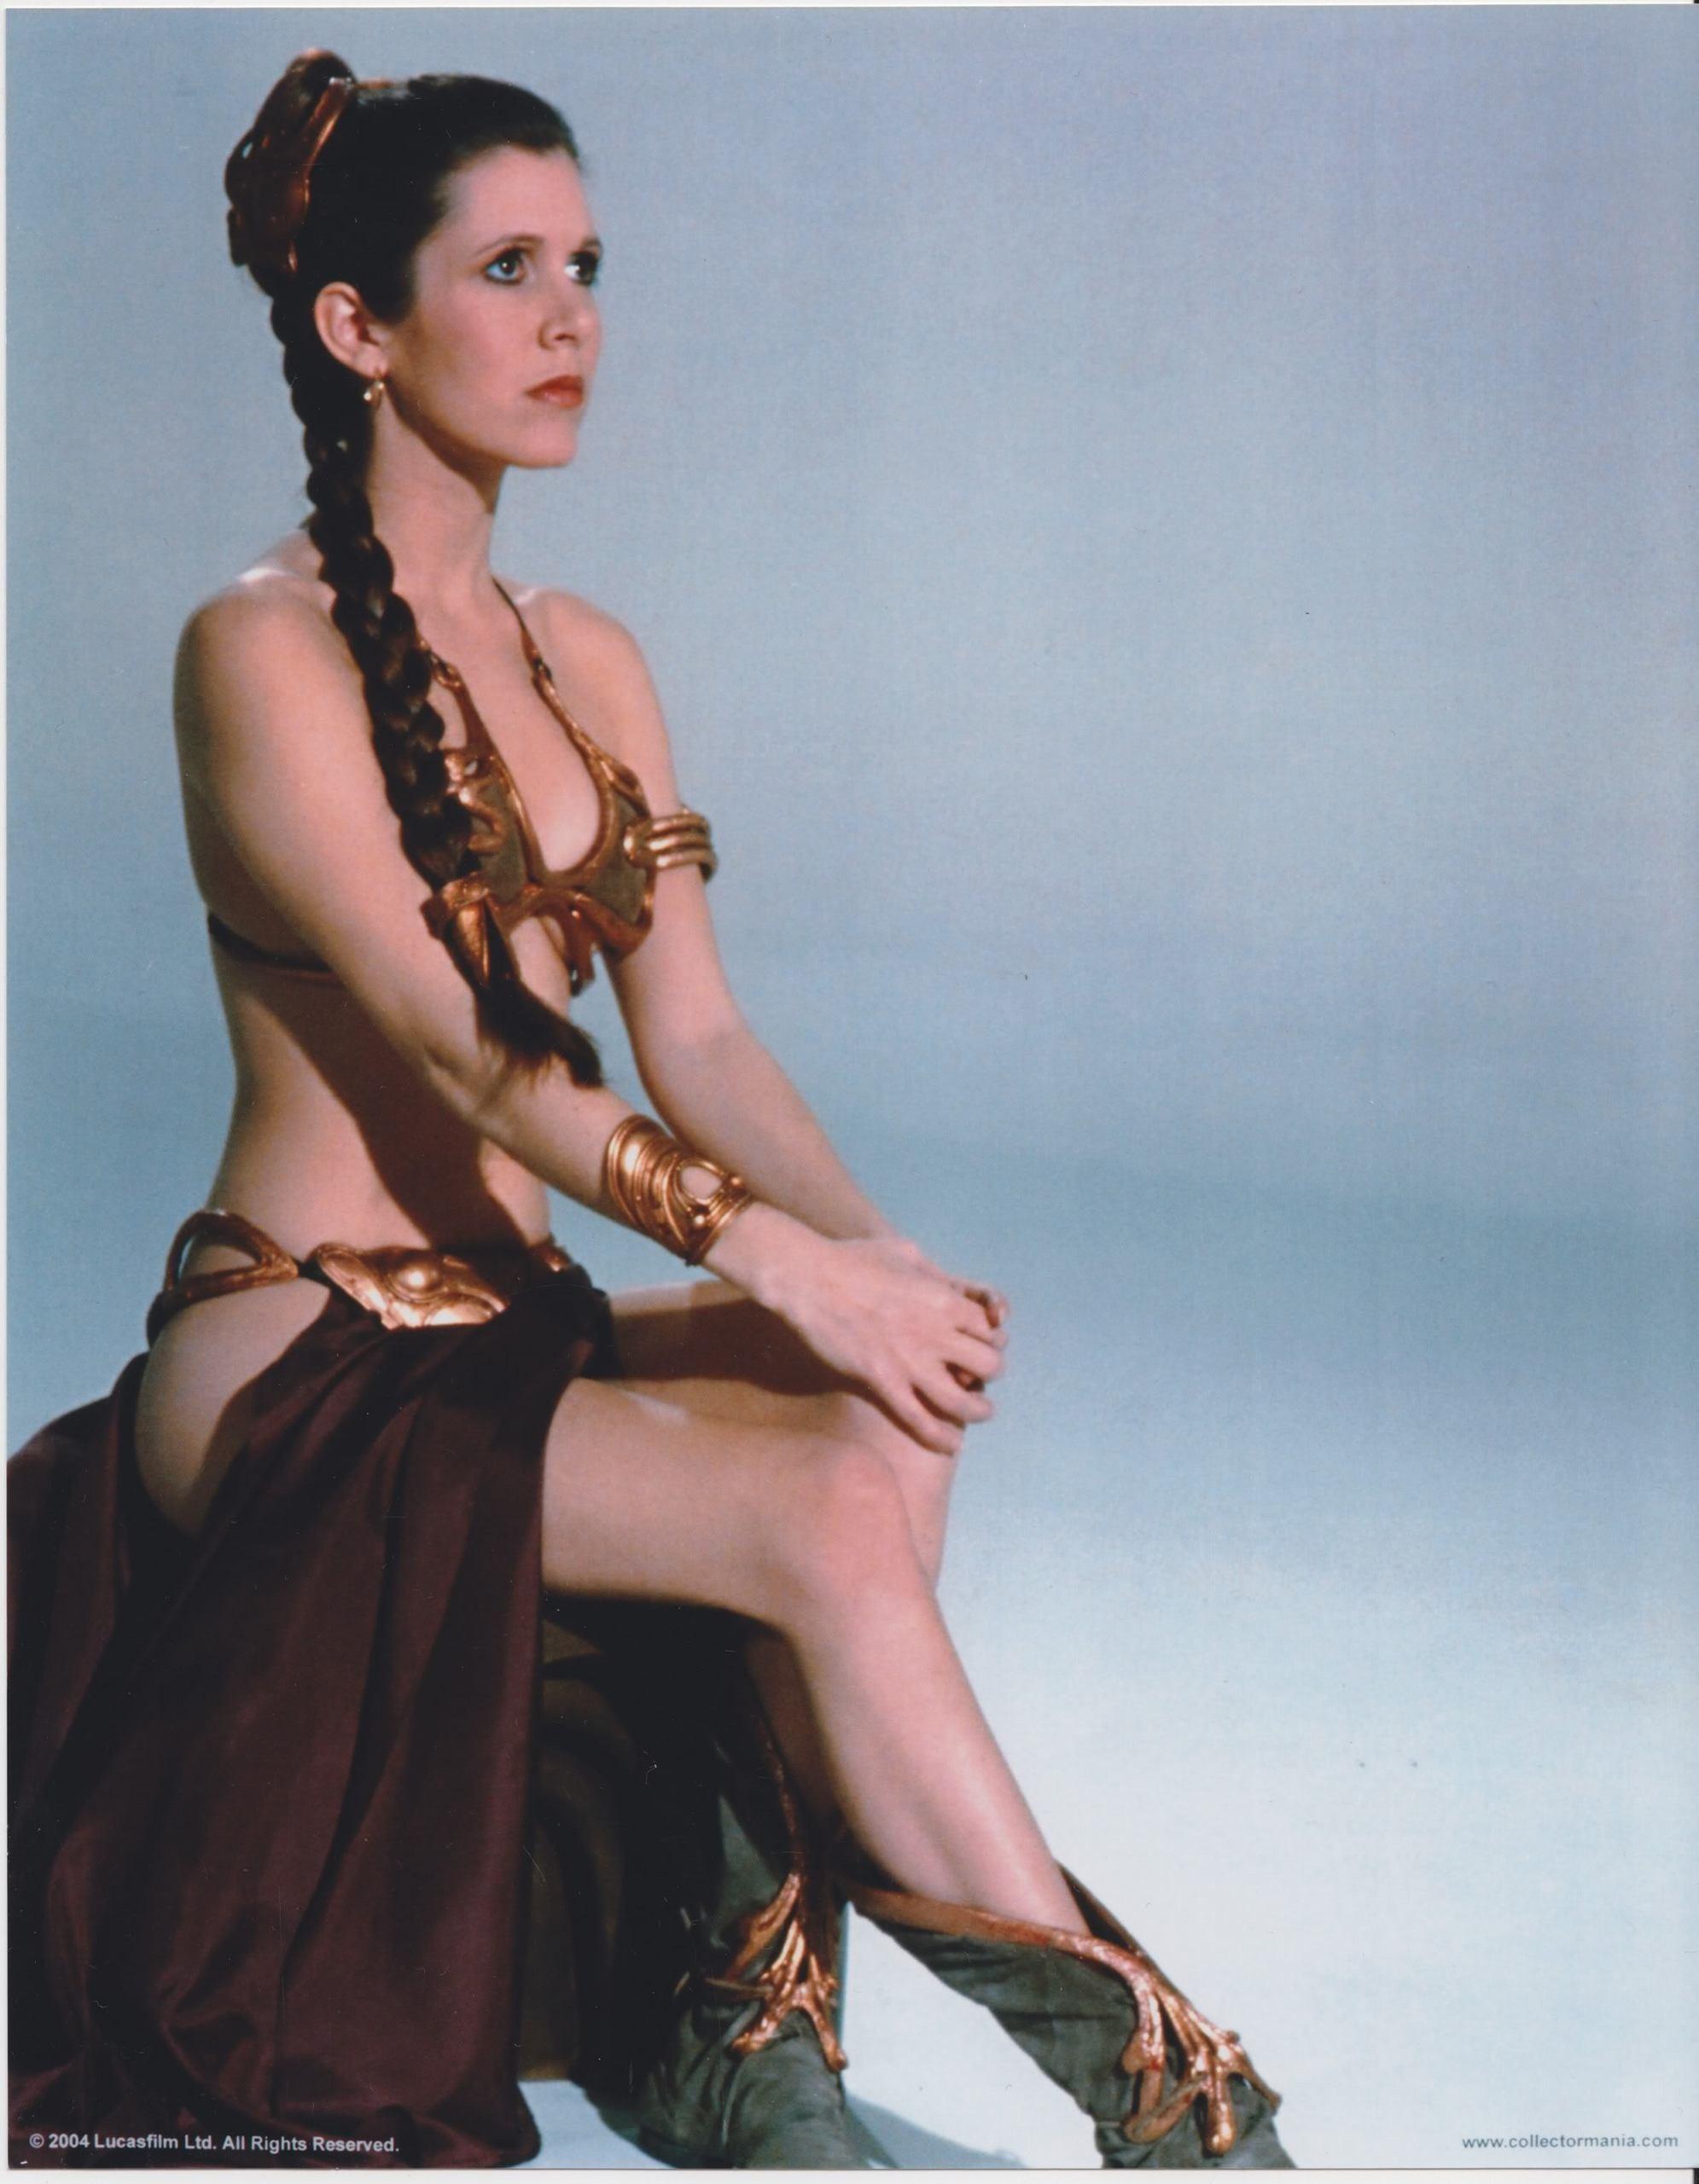 Princess Leia Slave Wallpaper 61 images